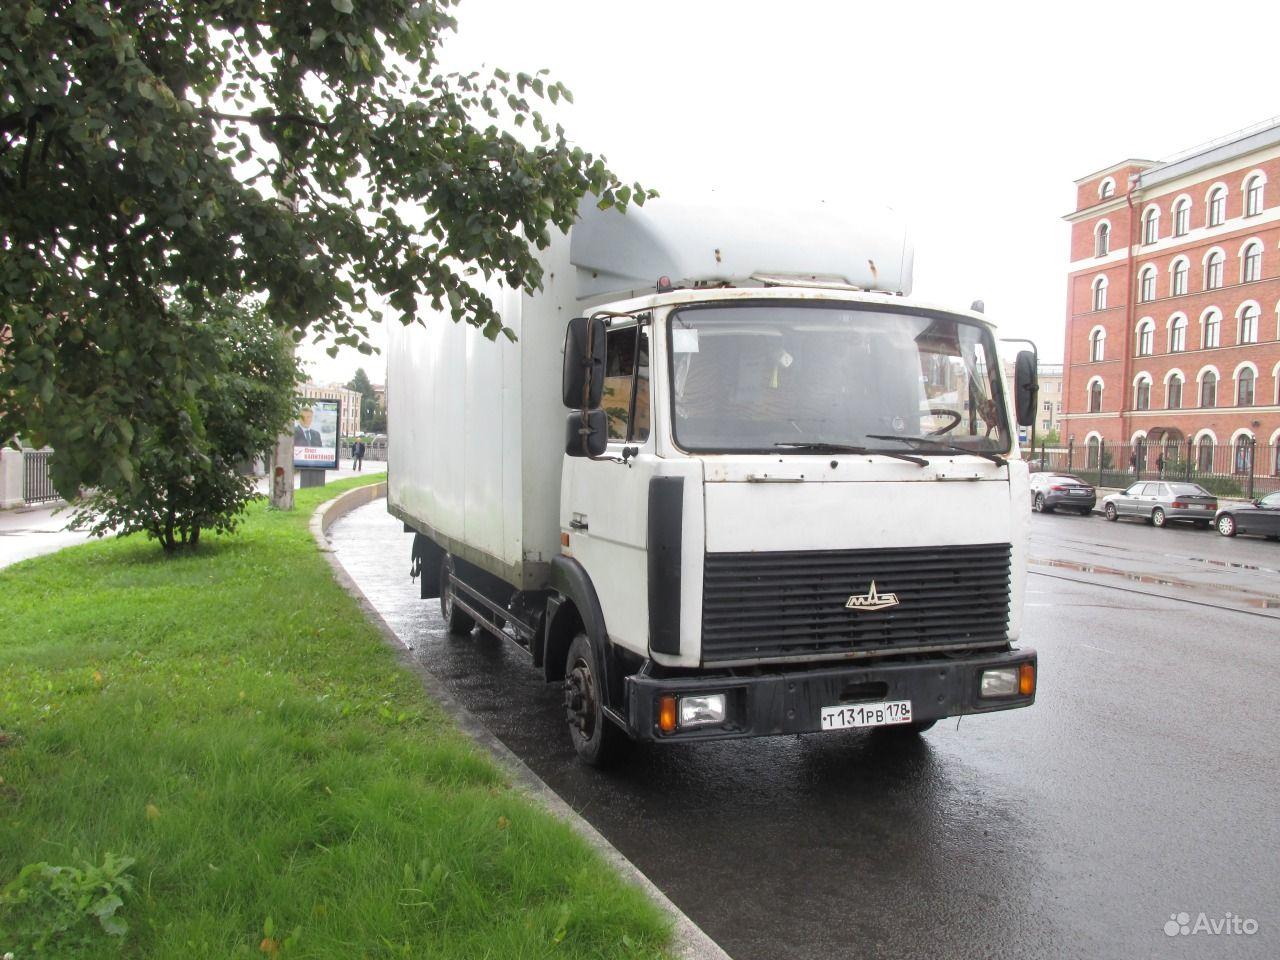 Маз 4370 зубренок двс ямз 236 обмен.  Санкт-Петербург